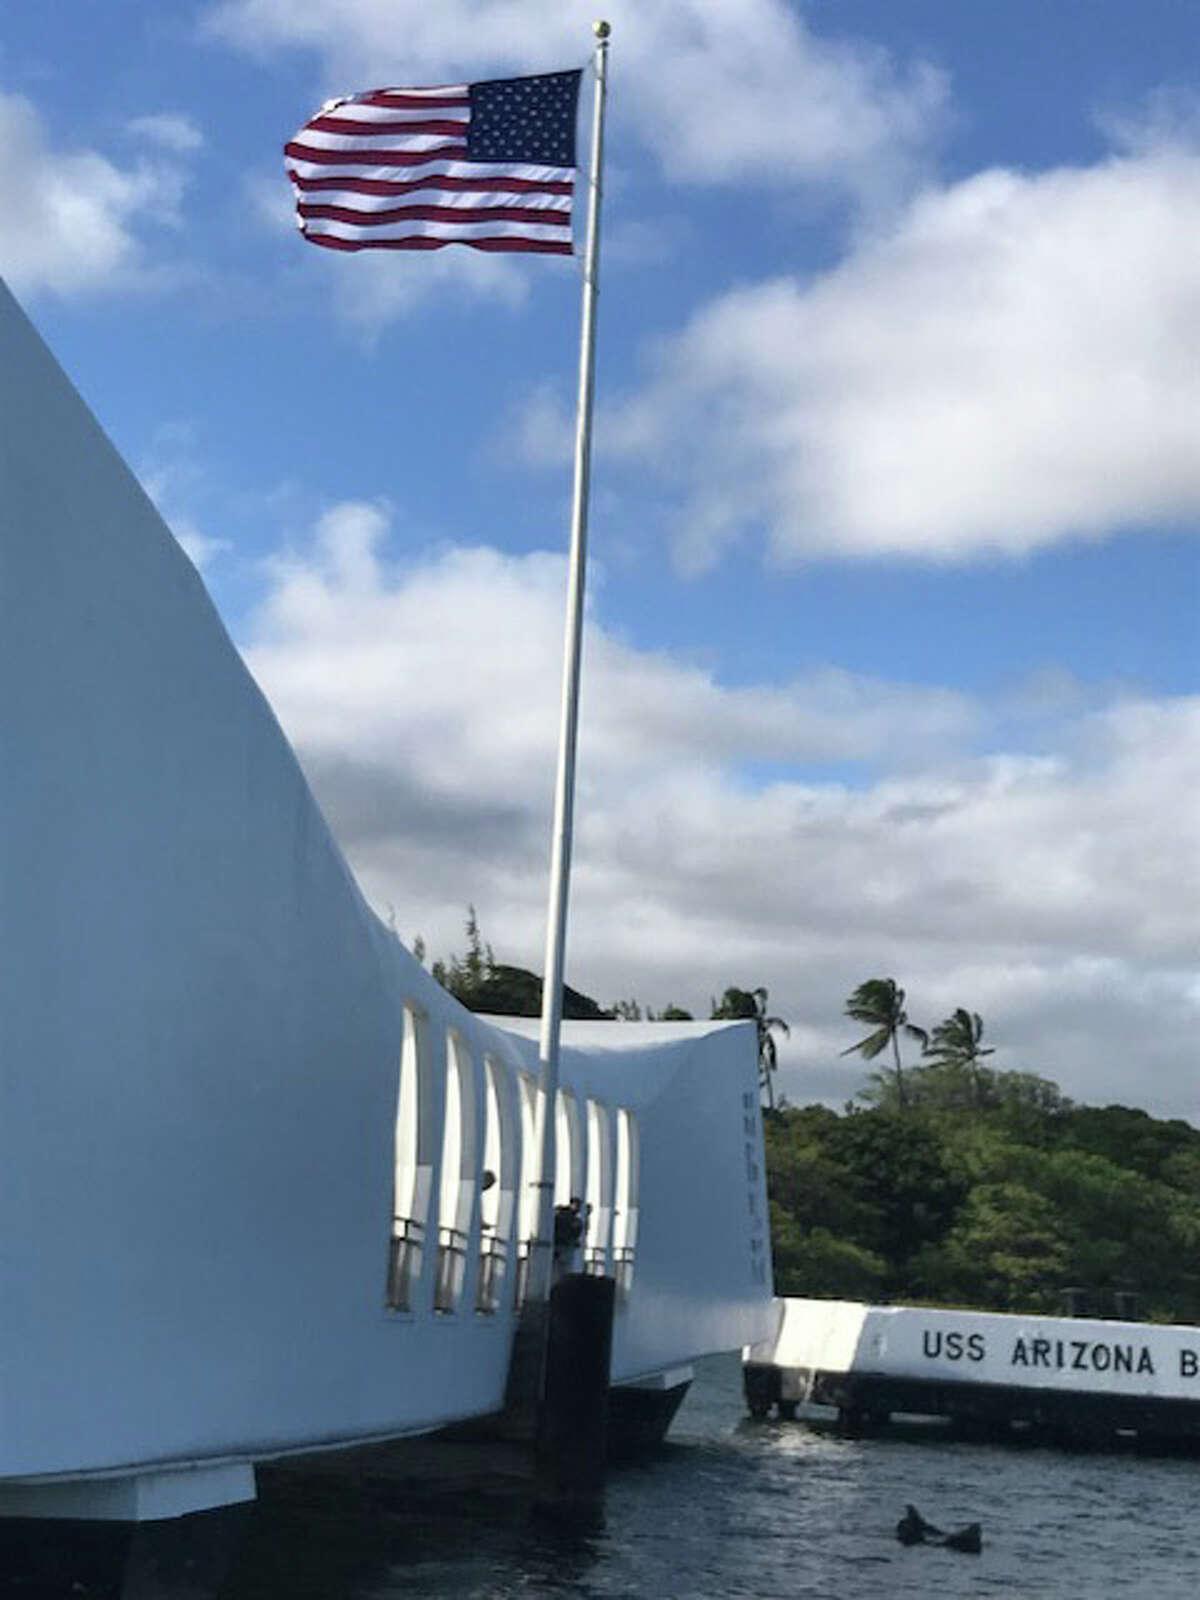 The USS Arizona Memorial.